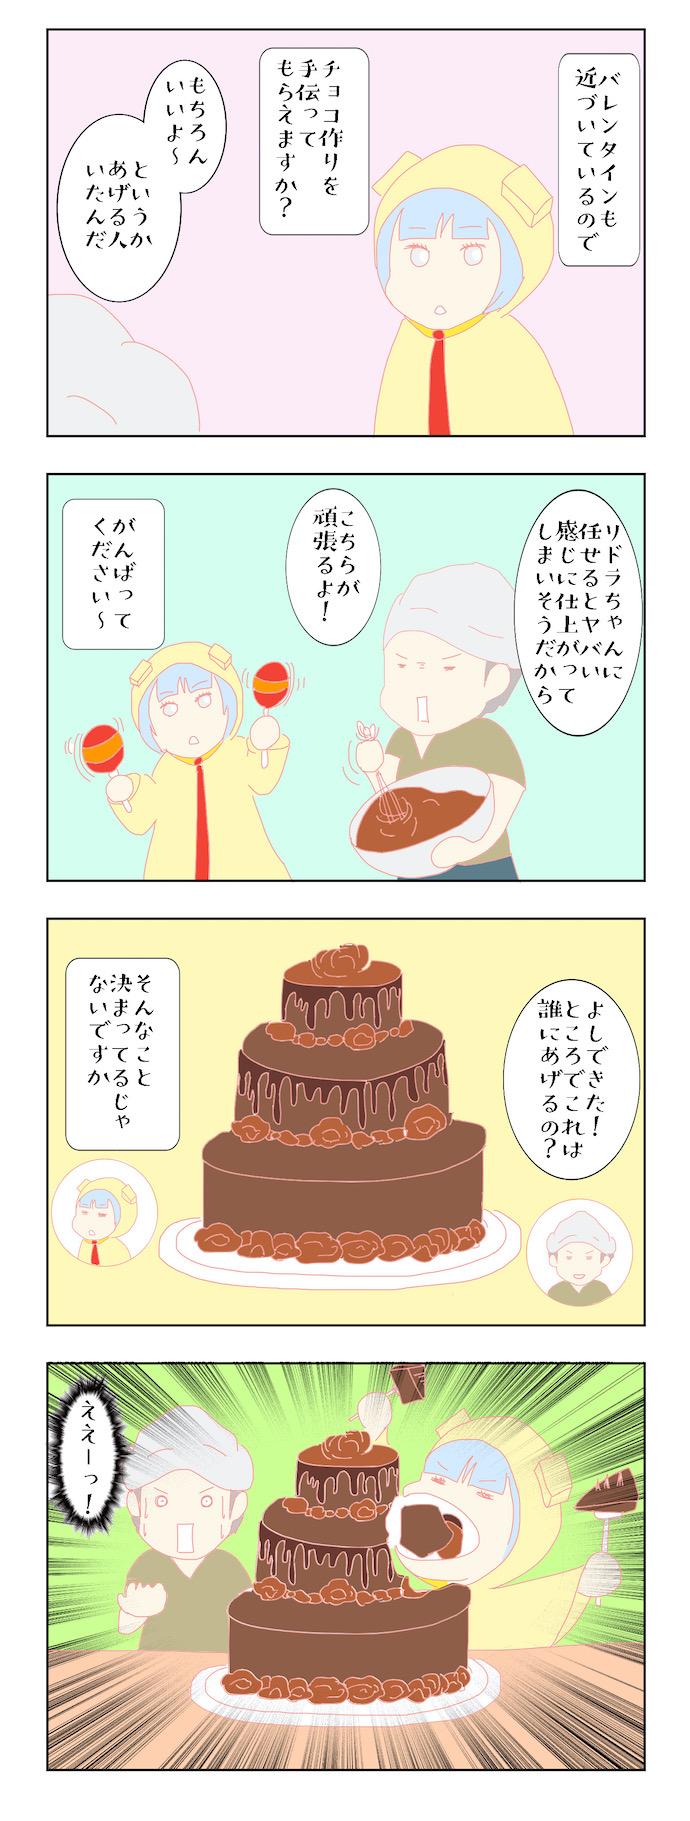 kimura_2002_01